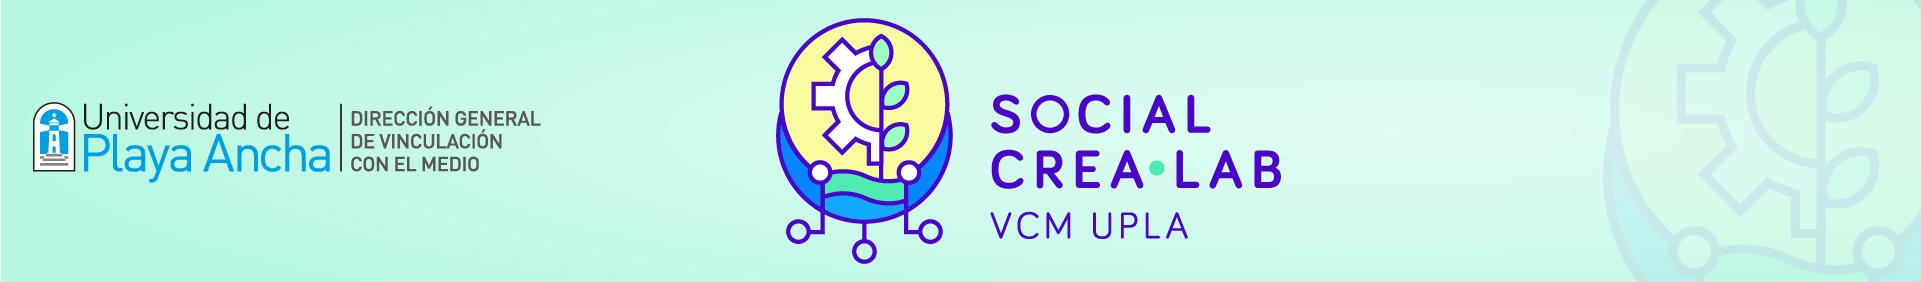 Fondos concursables VcM UPLA 2021 - Social CreaLab